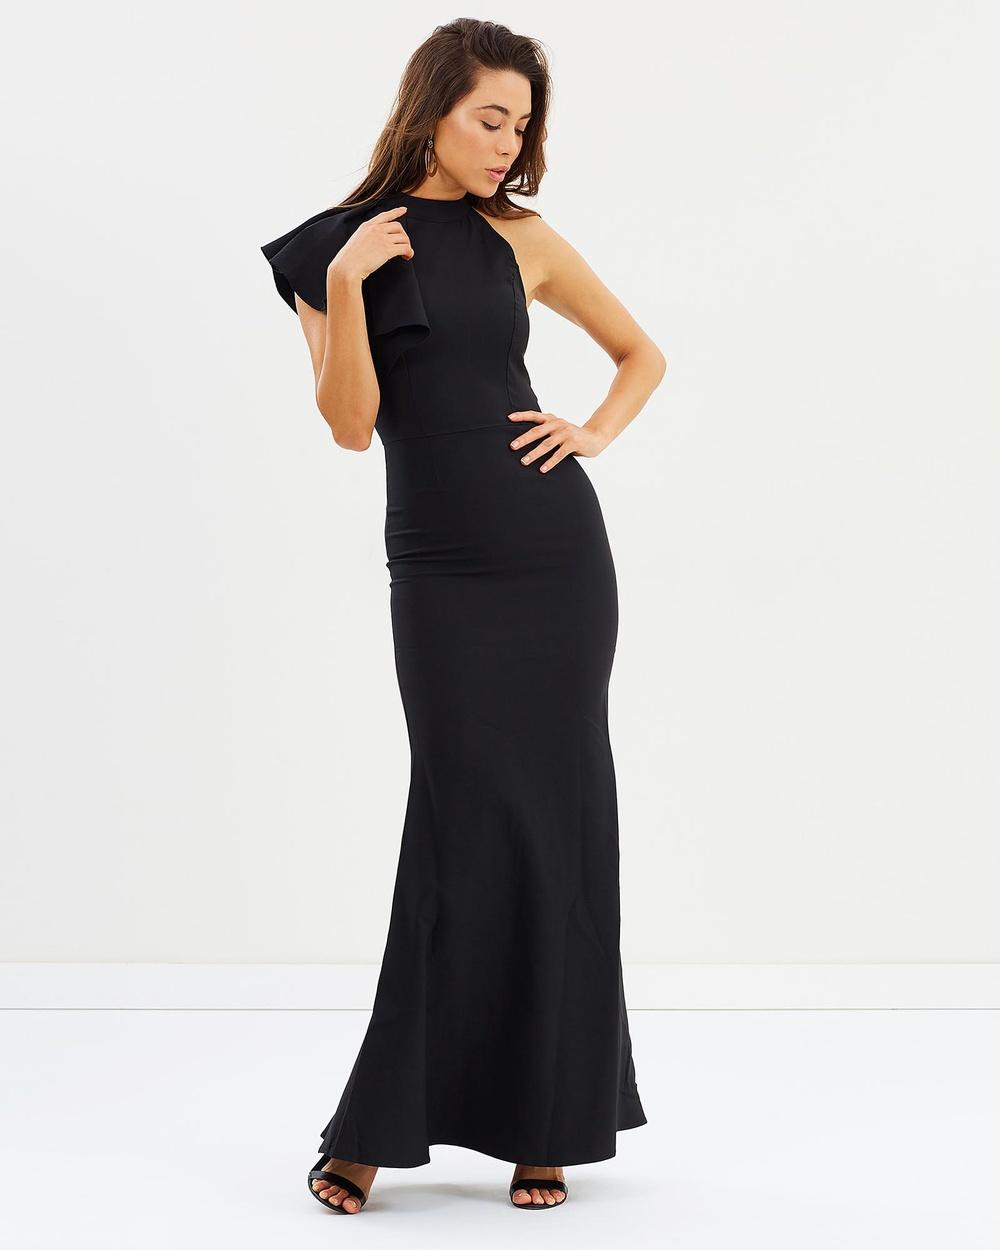 ROXCIIS Black Nora Flounce Shoulder Gown